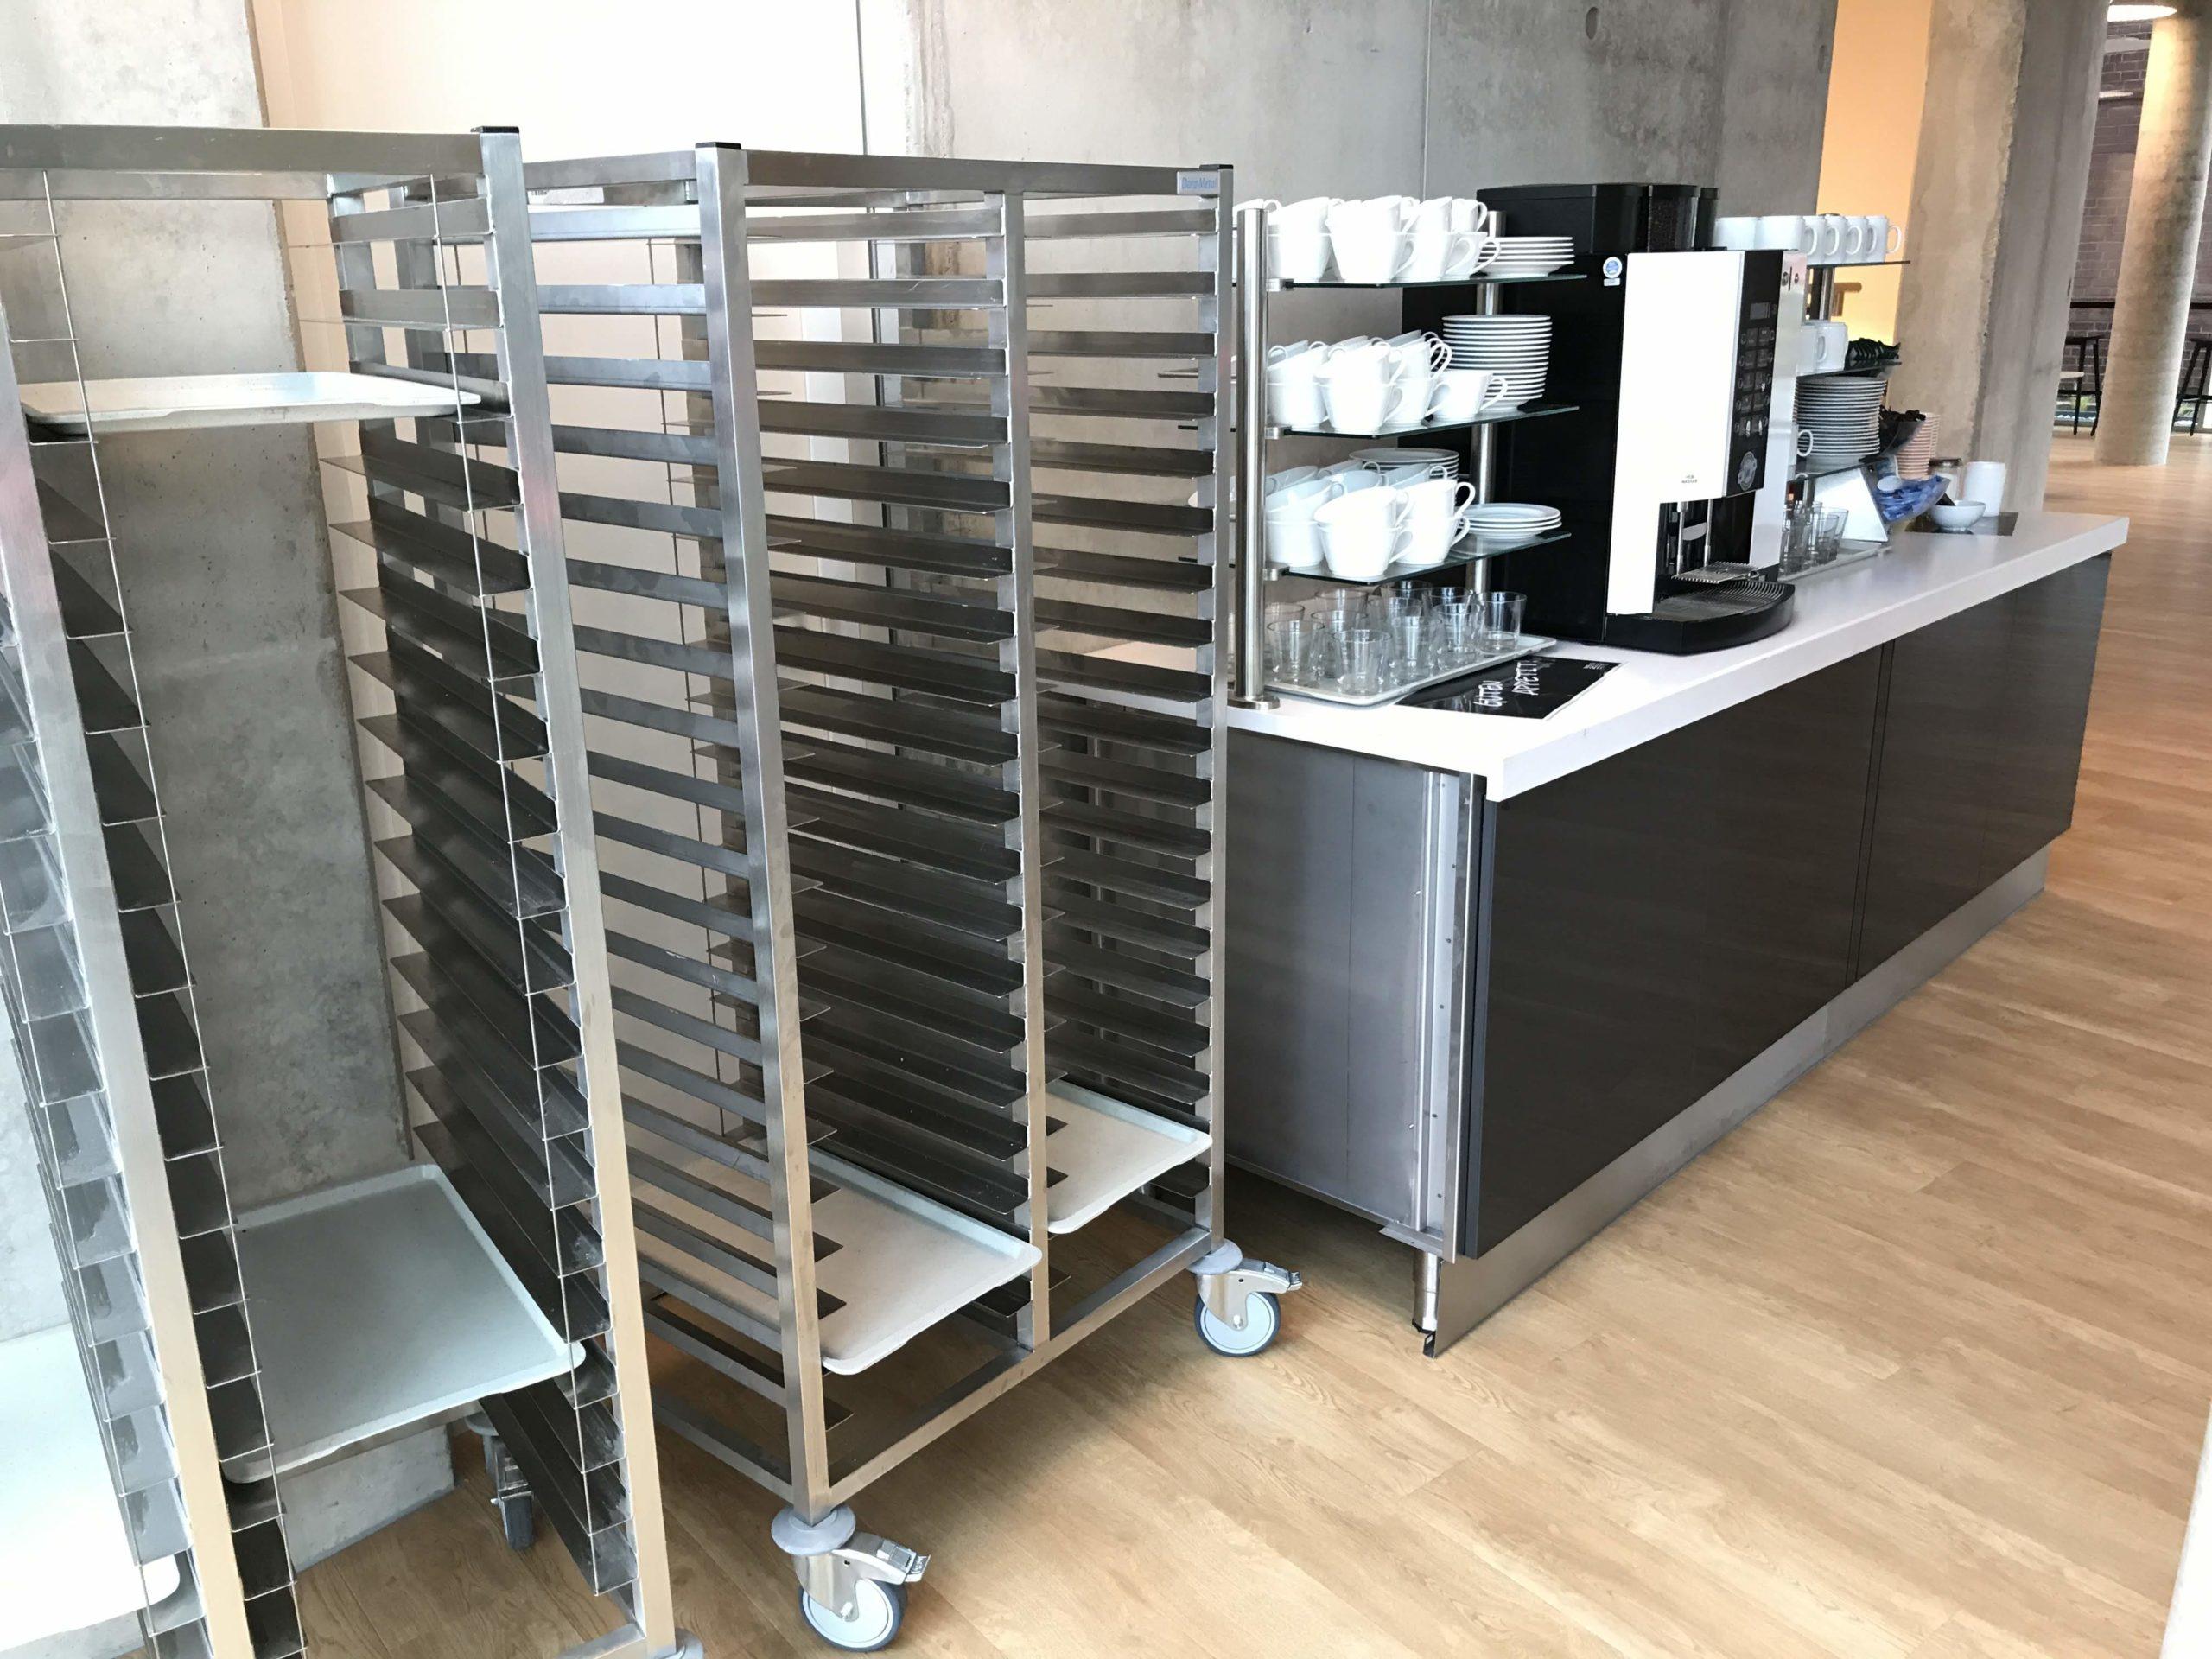 2019 - Fricke GmbH Heeslingen - ciąg wyd. bufety - DE (27)